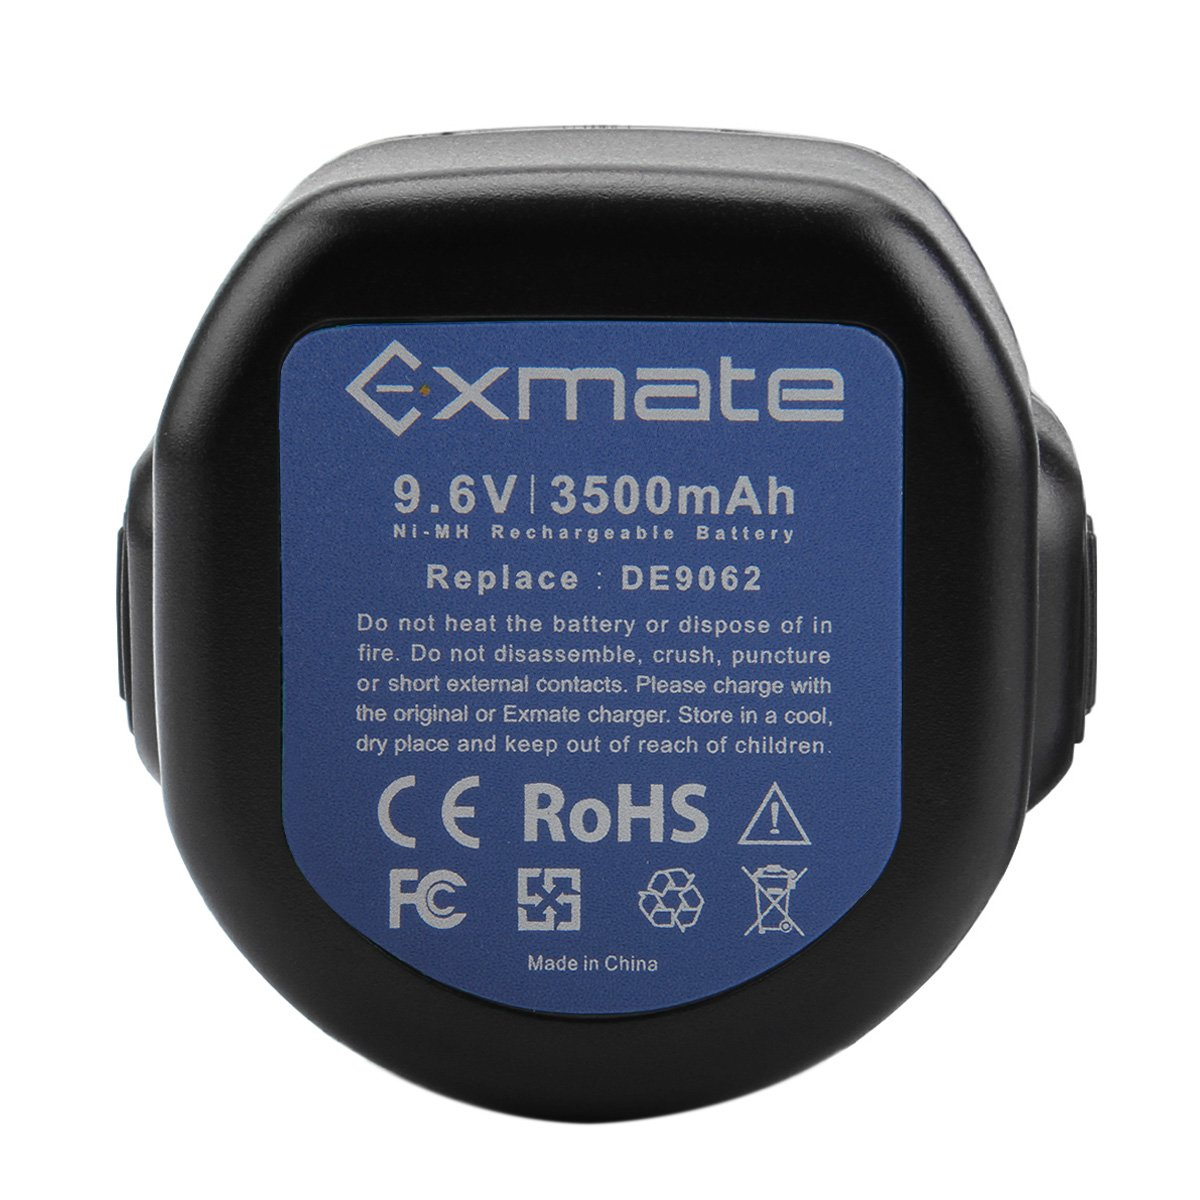 Exmate 9.6V 3.5Ah Ni-MH Bater/ía para Dewalt DE9036 DE9061 DE9062 DW9061 DW9062 DC750KA DC855KA DW050 DW050K DW902 DW926K DW926K-2 DW952 DW955 DW955K DW955K-2